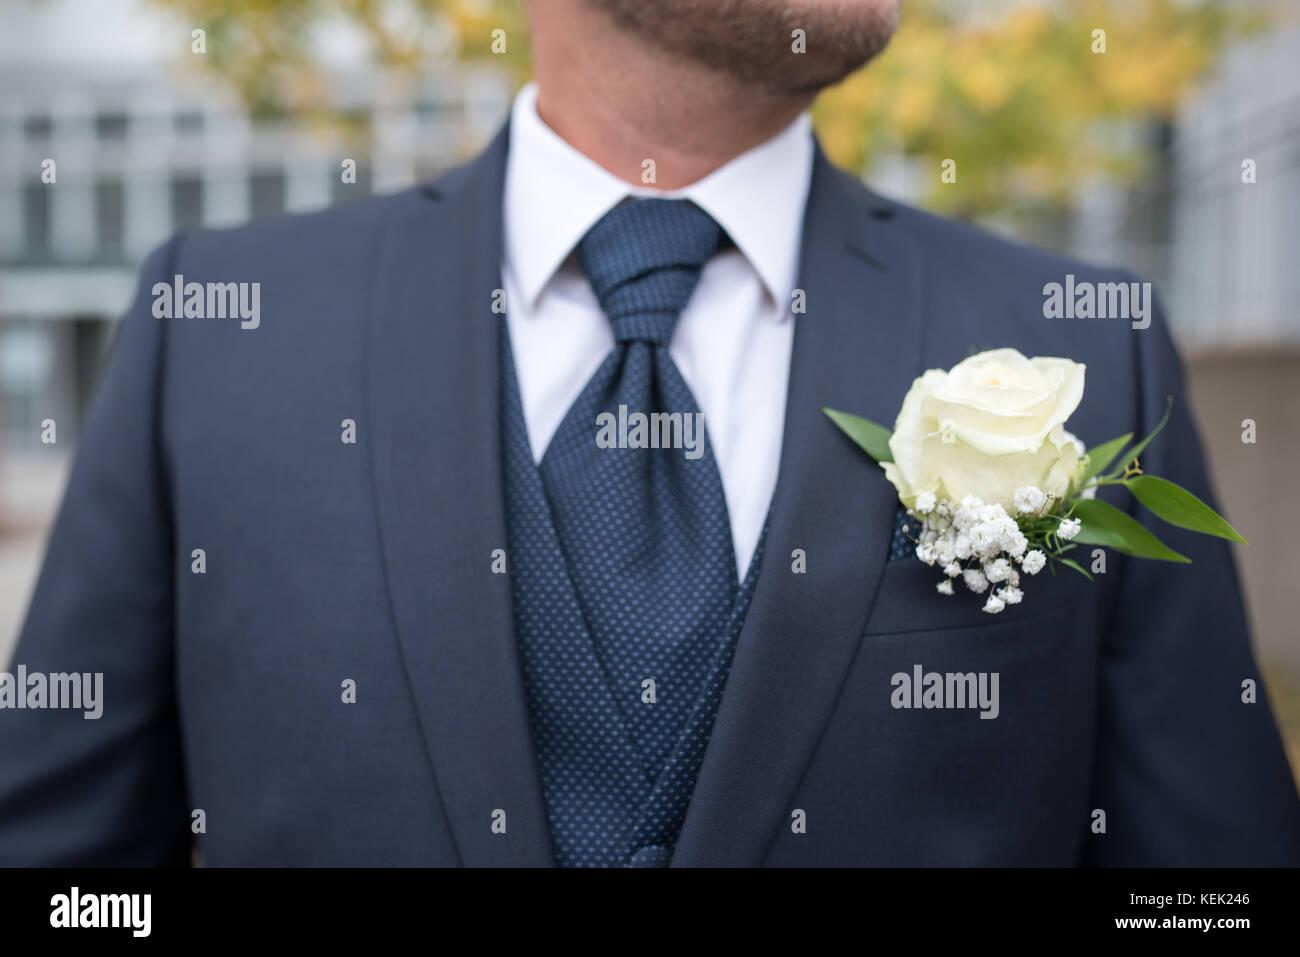 Symbolisch, symbolbild bräutigam, novio. blauer anzug